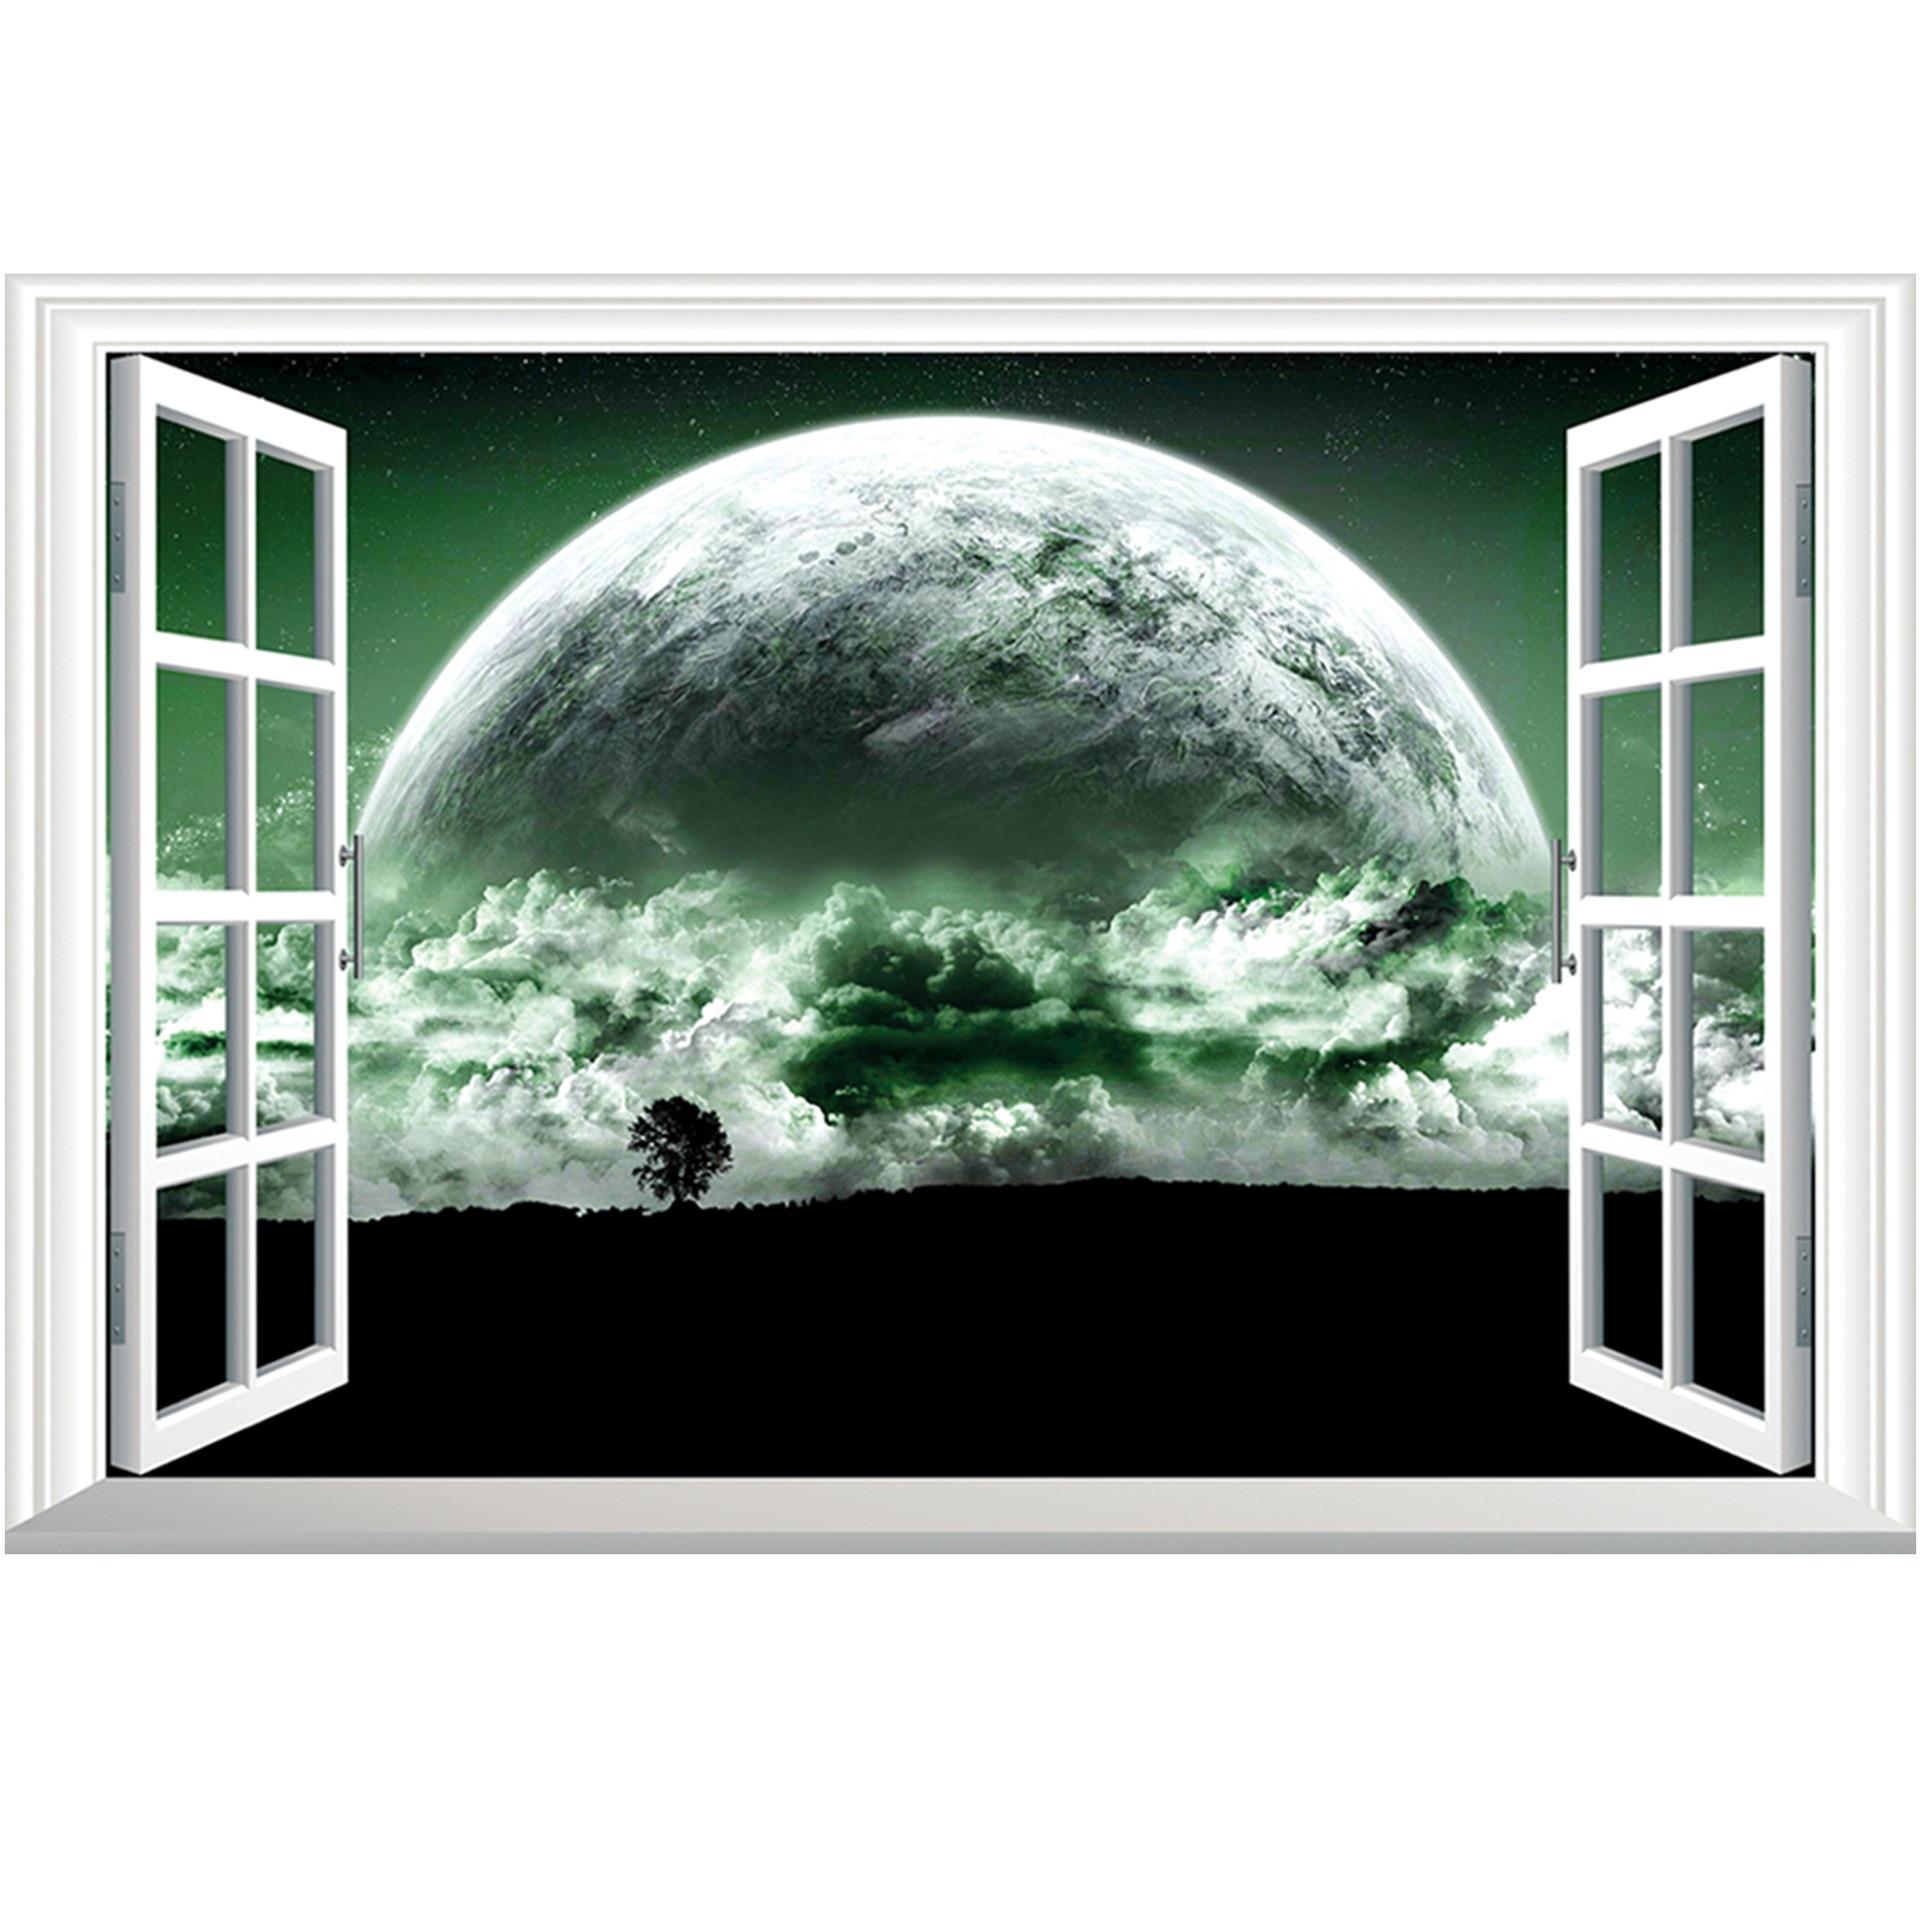 Super Planet 3d Wall Sticker Removable Window View Landscape Wallpaper Home Decor Oo 101